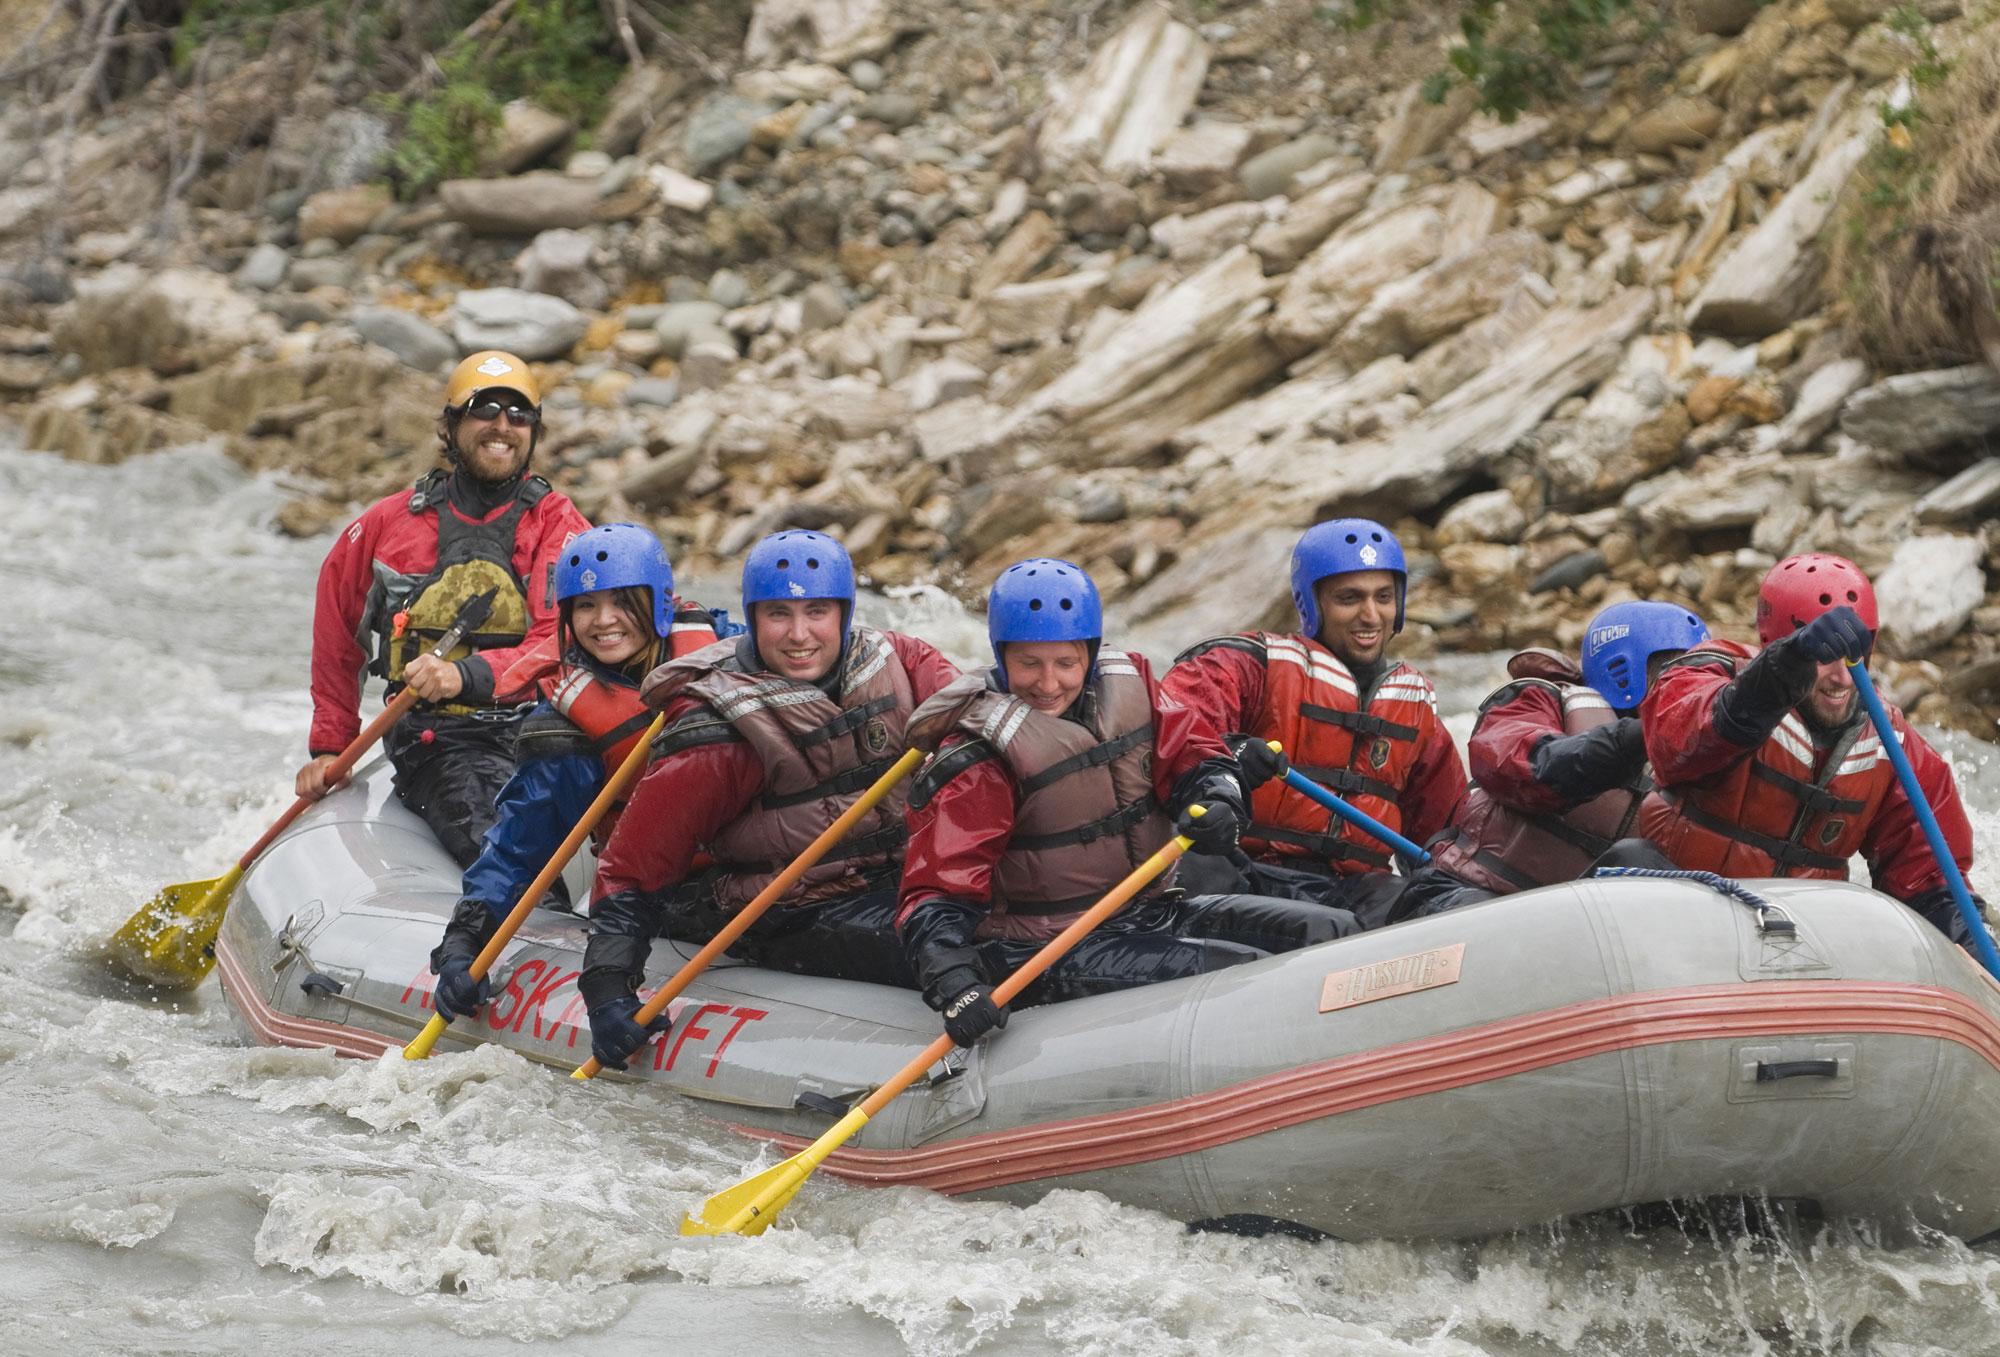 Rafting in Denali (c) Aramark Parks & Destinations